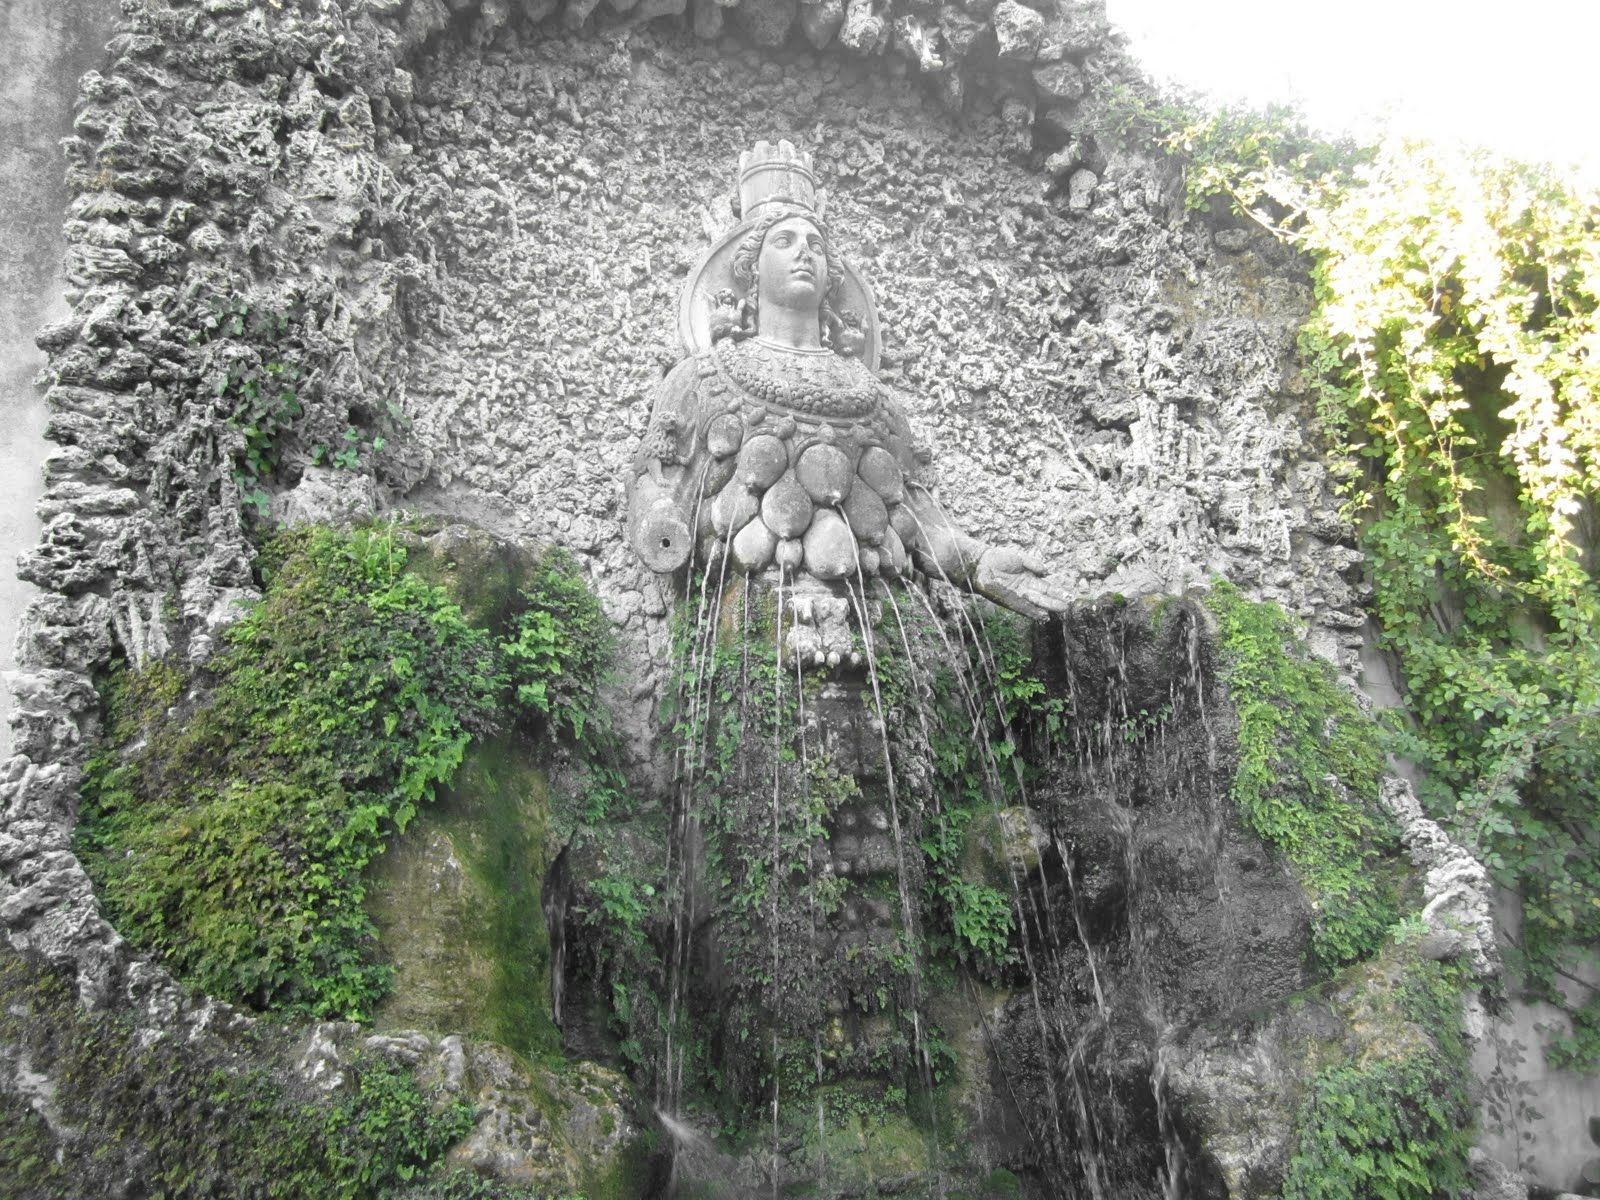 Ephesus, Turkey, Mother Nature Diana